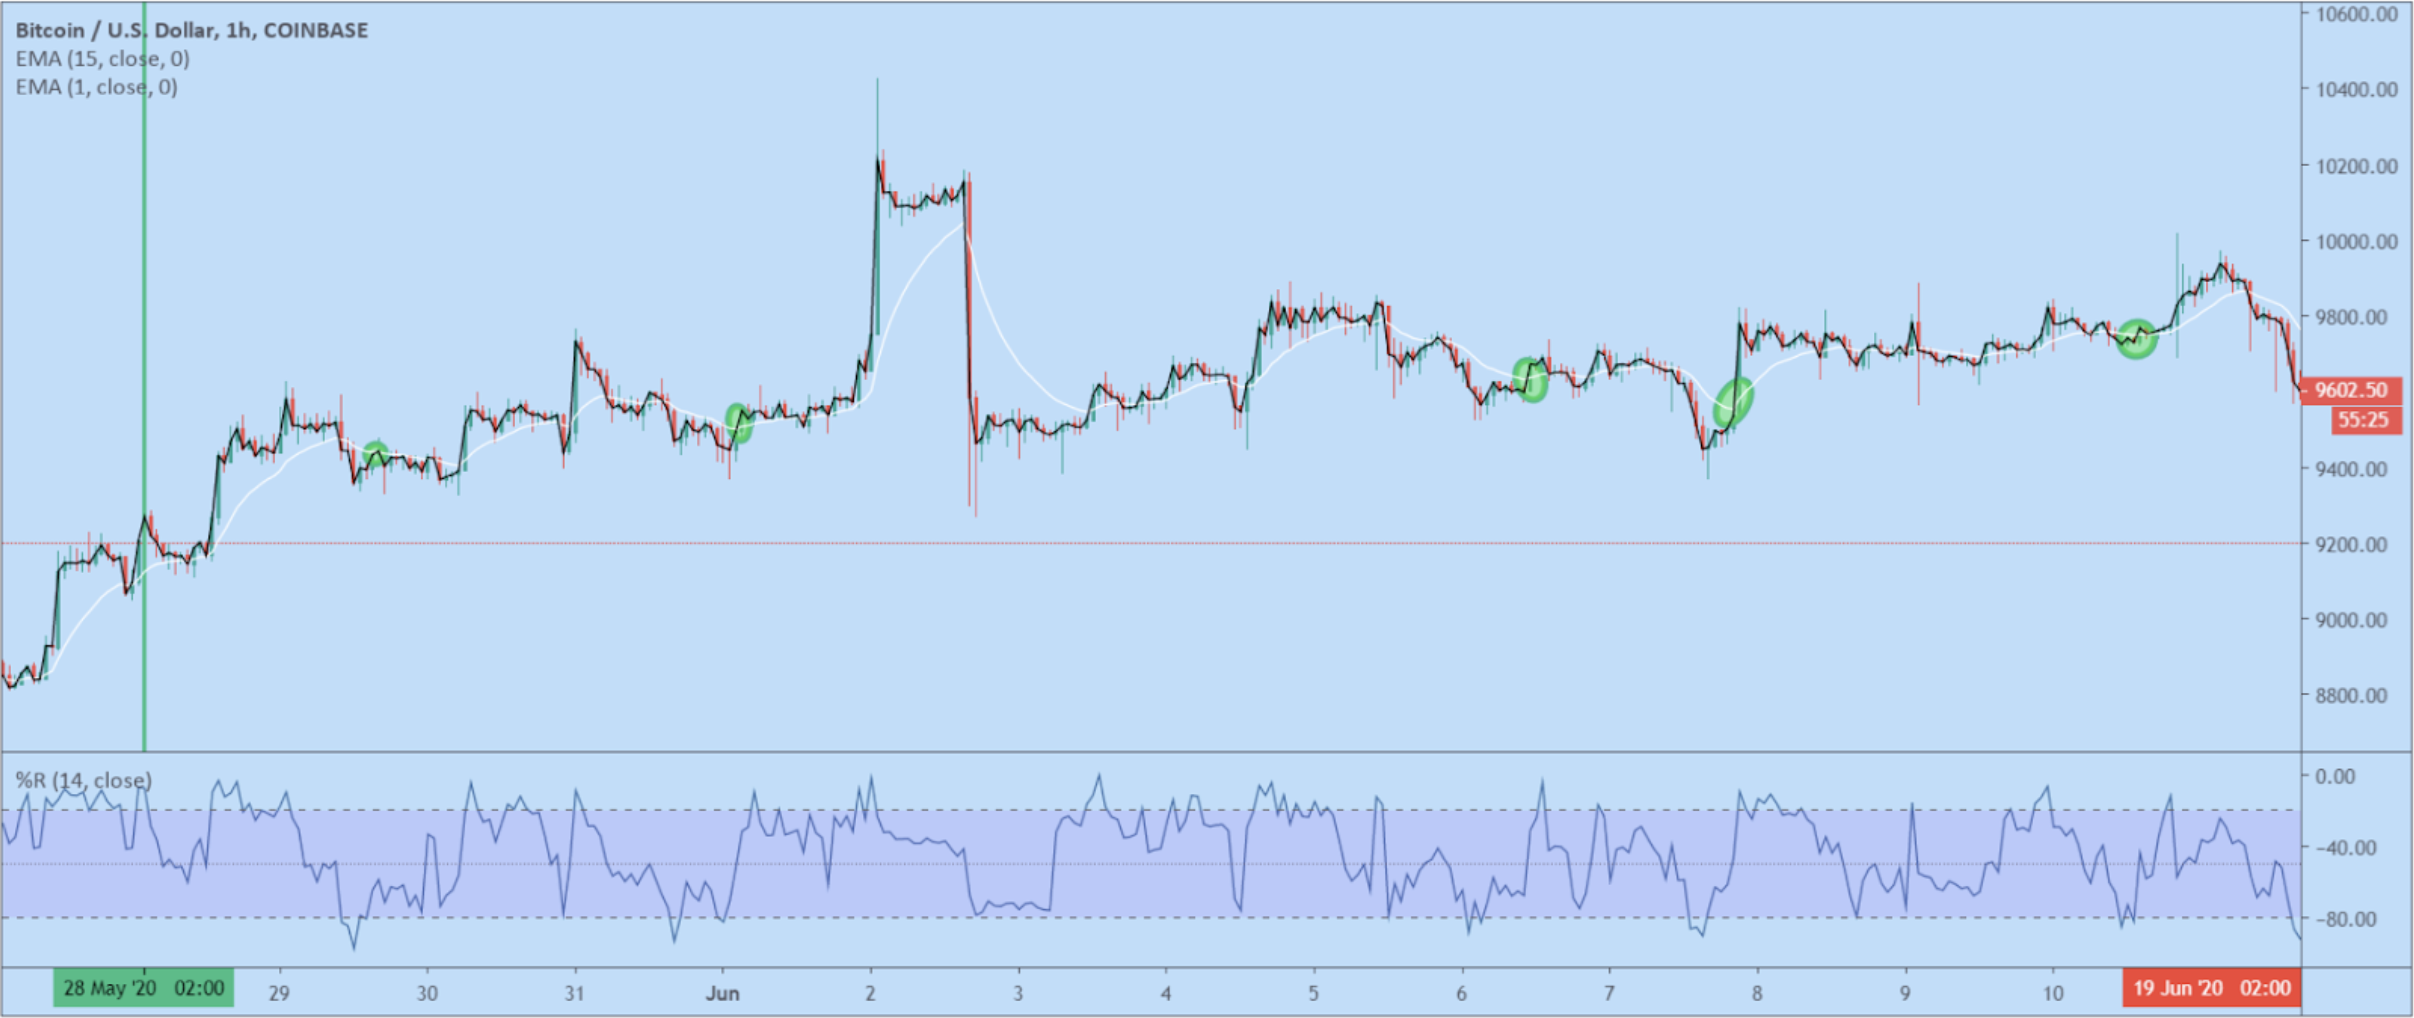 TA indicators technical analysis Automated automatic trading bot platform crypto cryptocurrencies Cryptohopper bitcoin ethereum